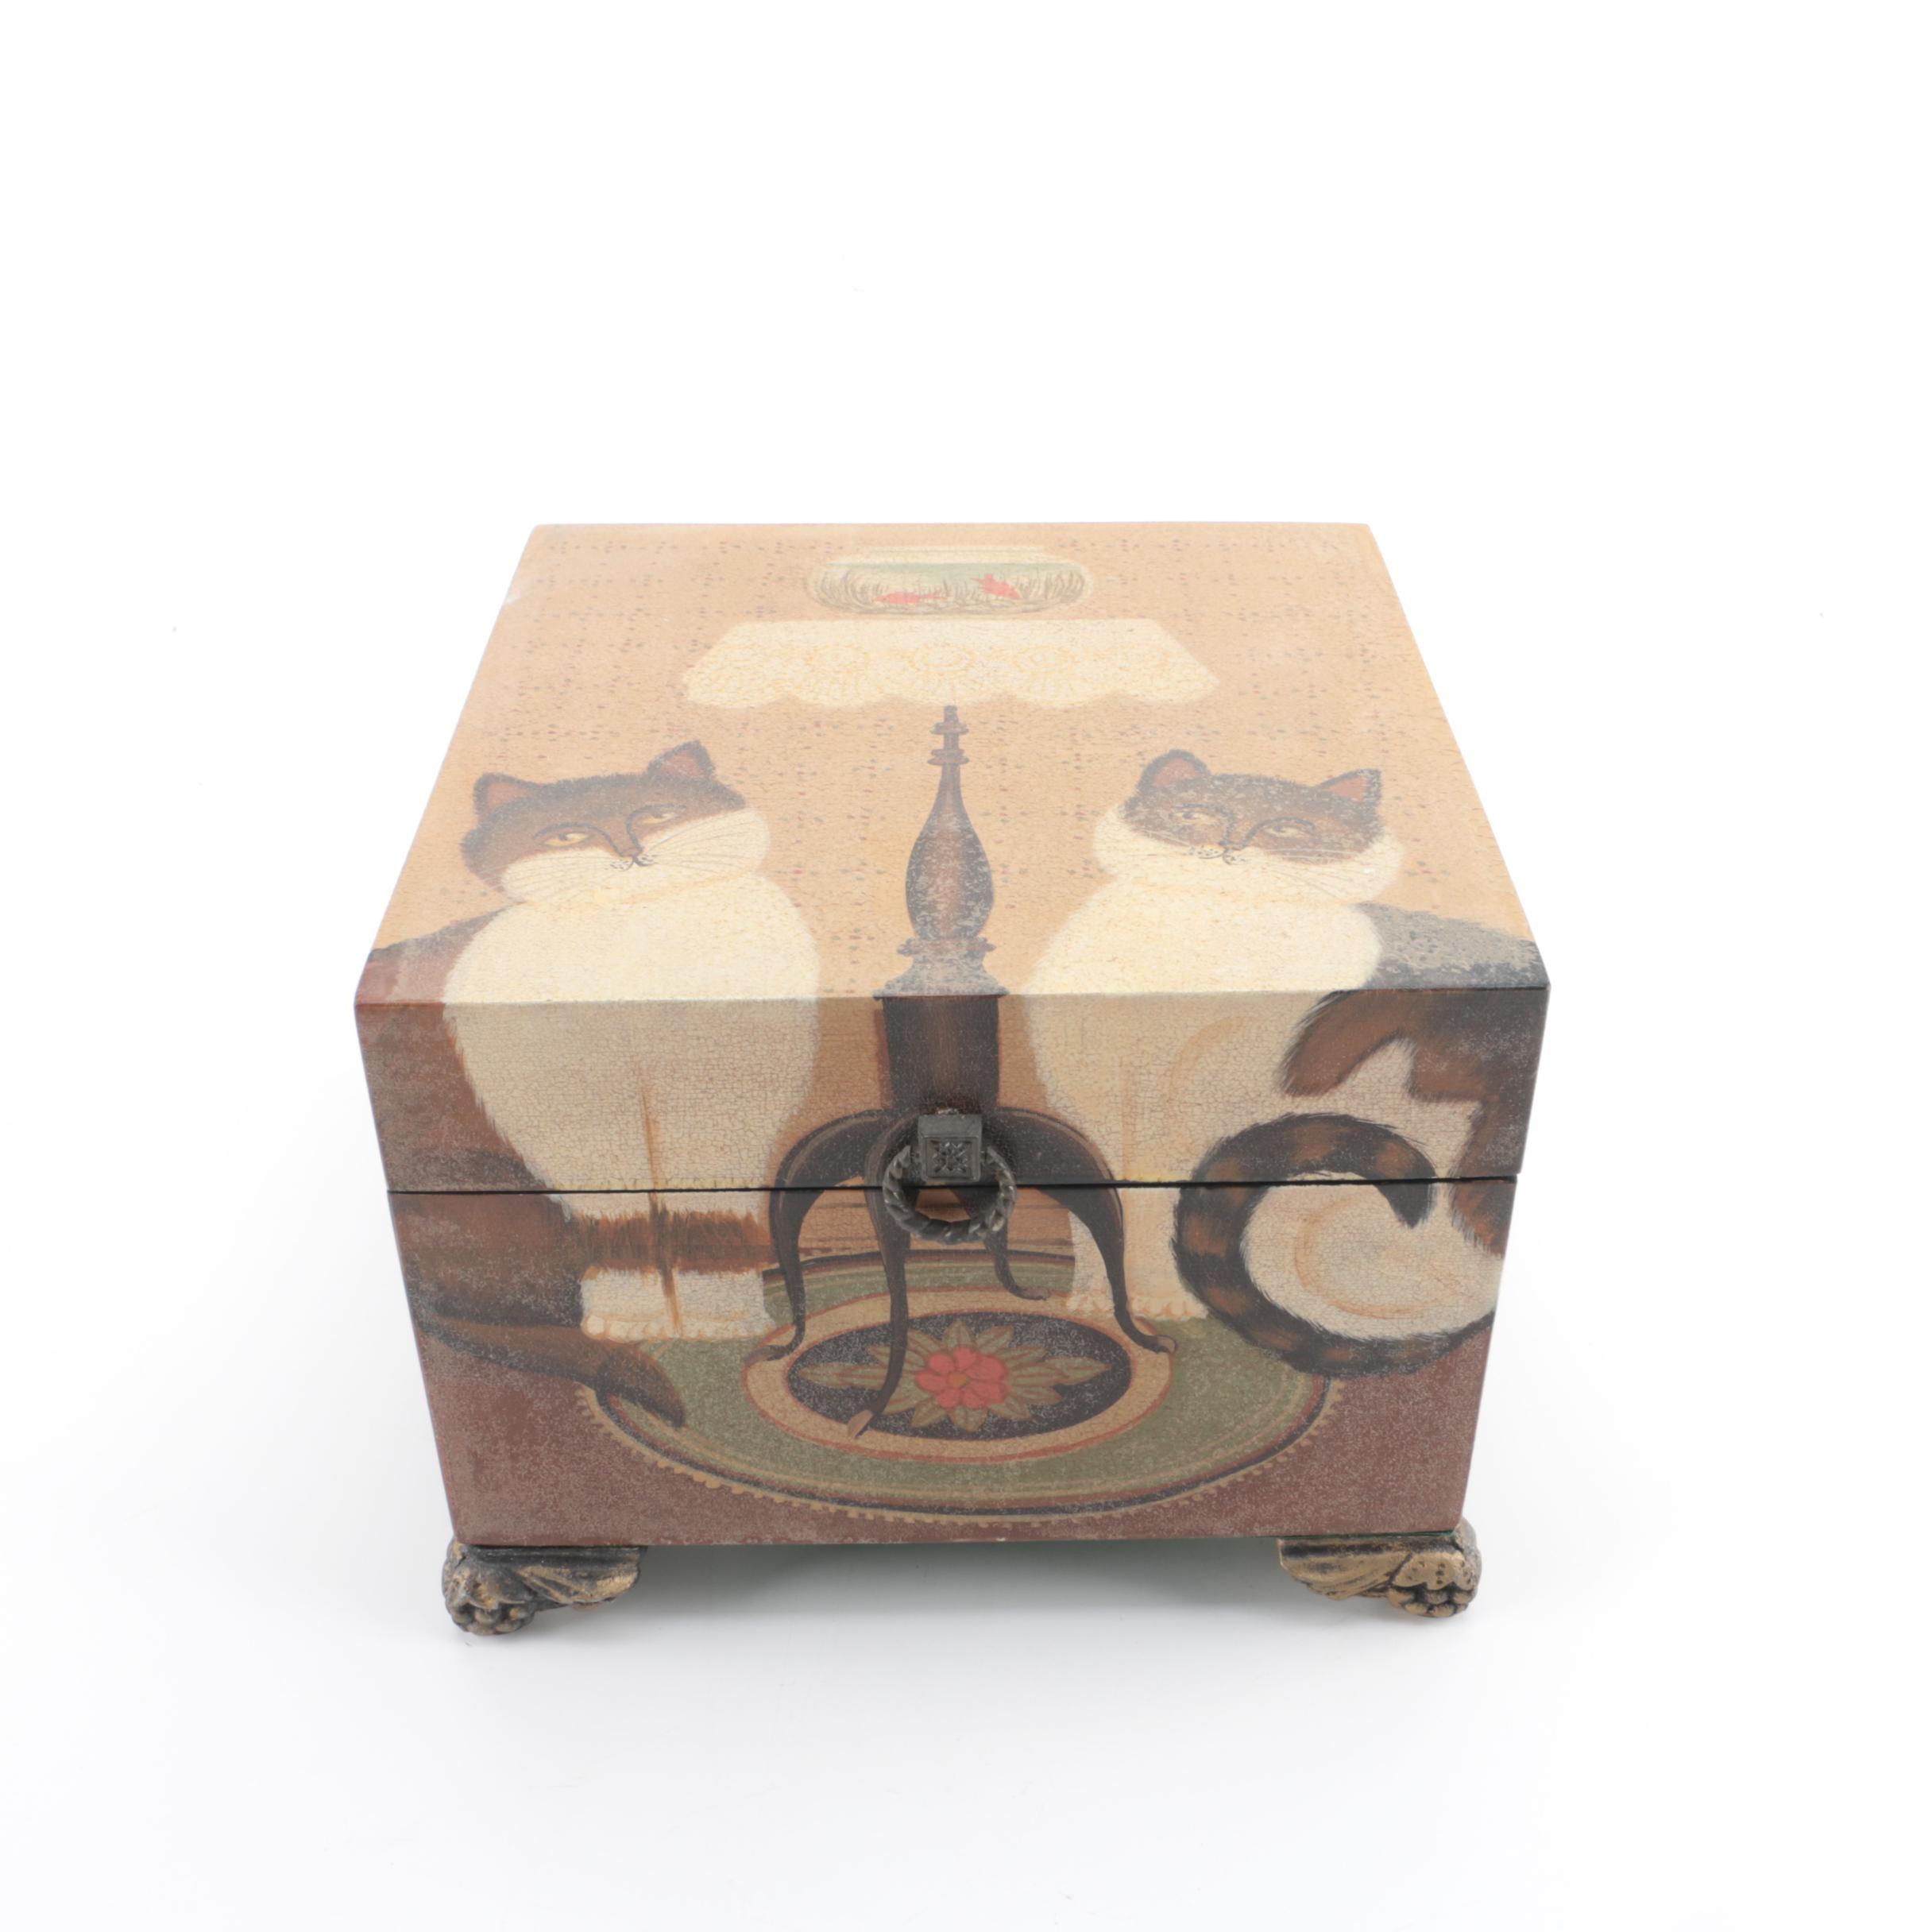 Feline Themed Wooden Box